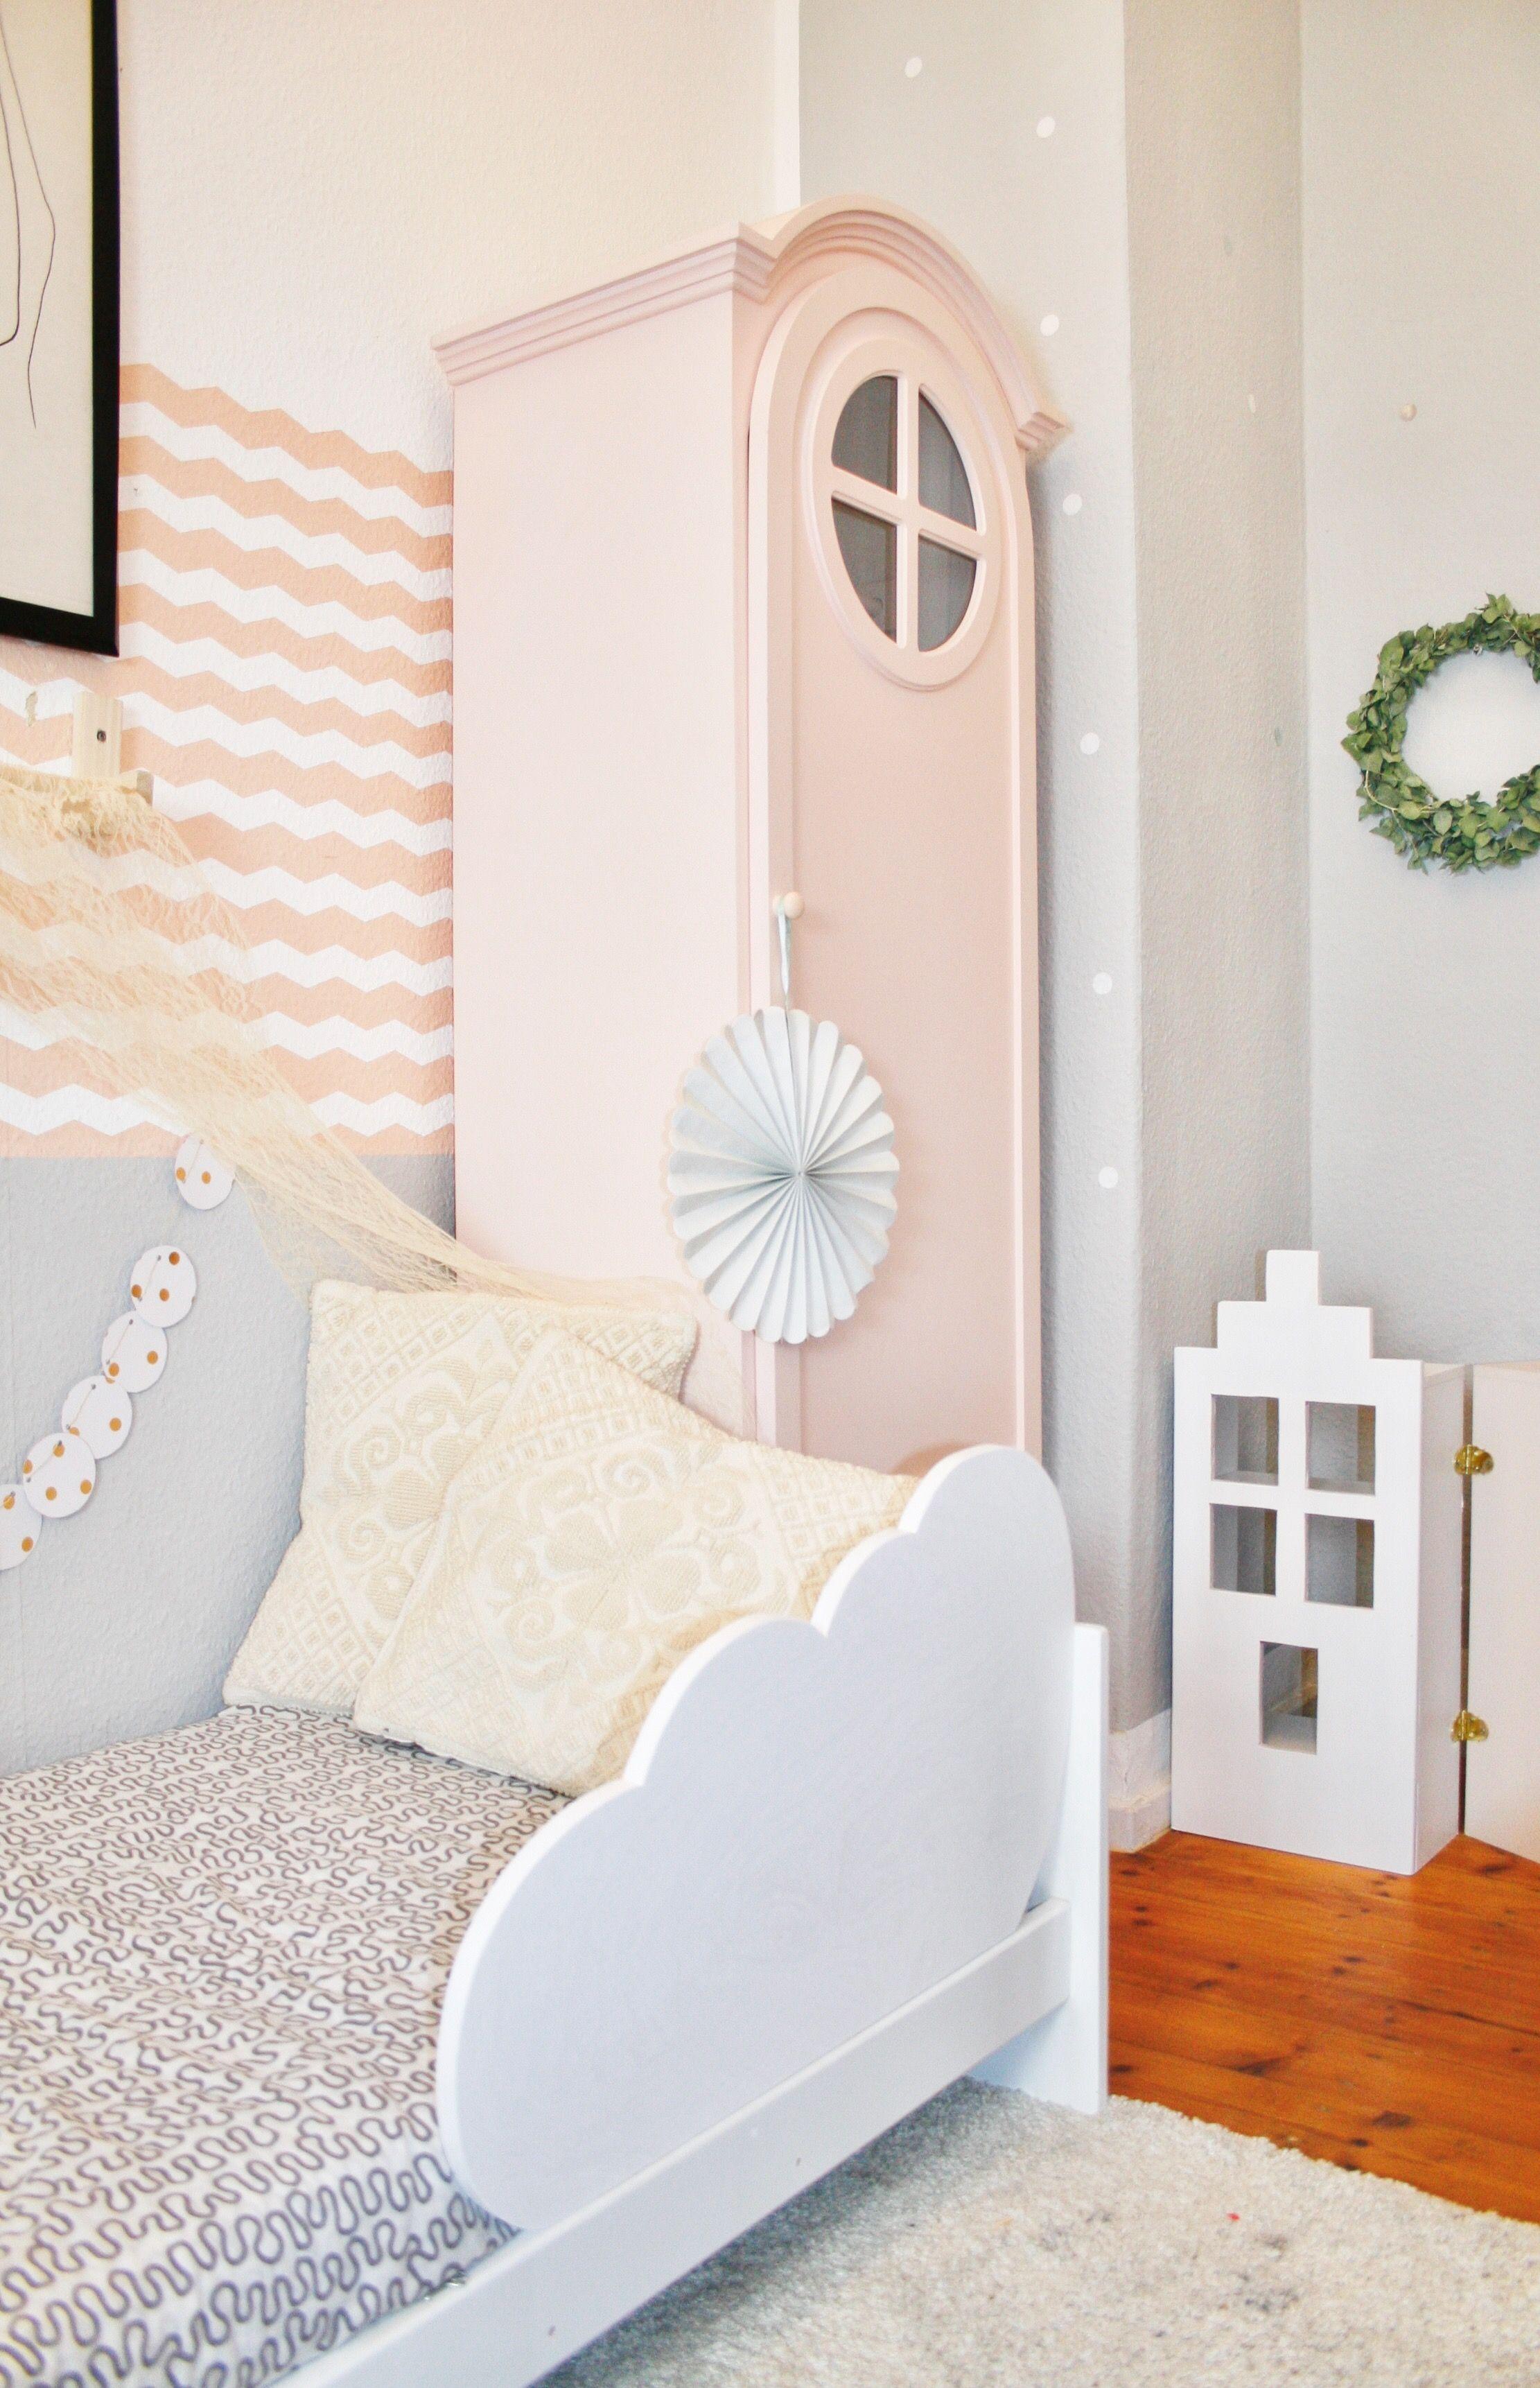 Kinderzimmer Mit Rausfallschutz Wolke Bettschutzgitter Bedrail